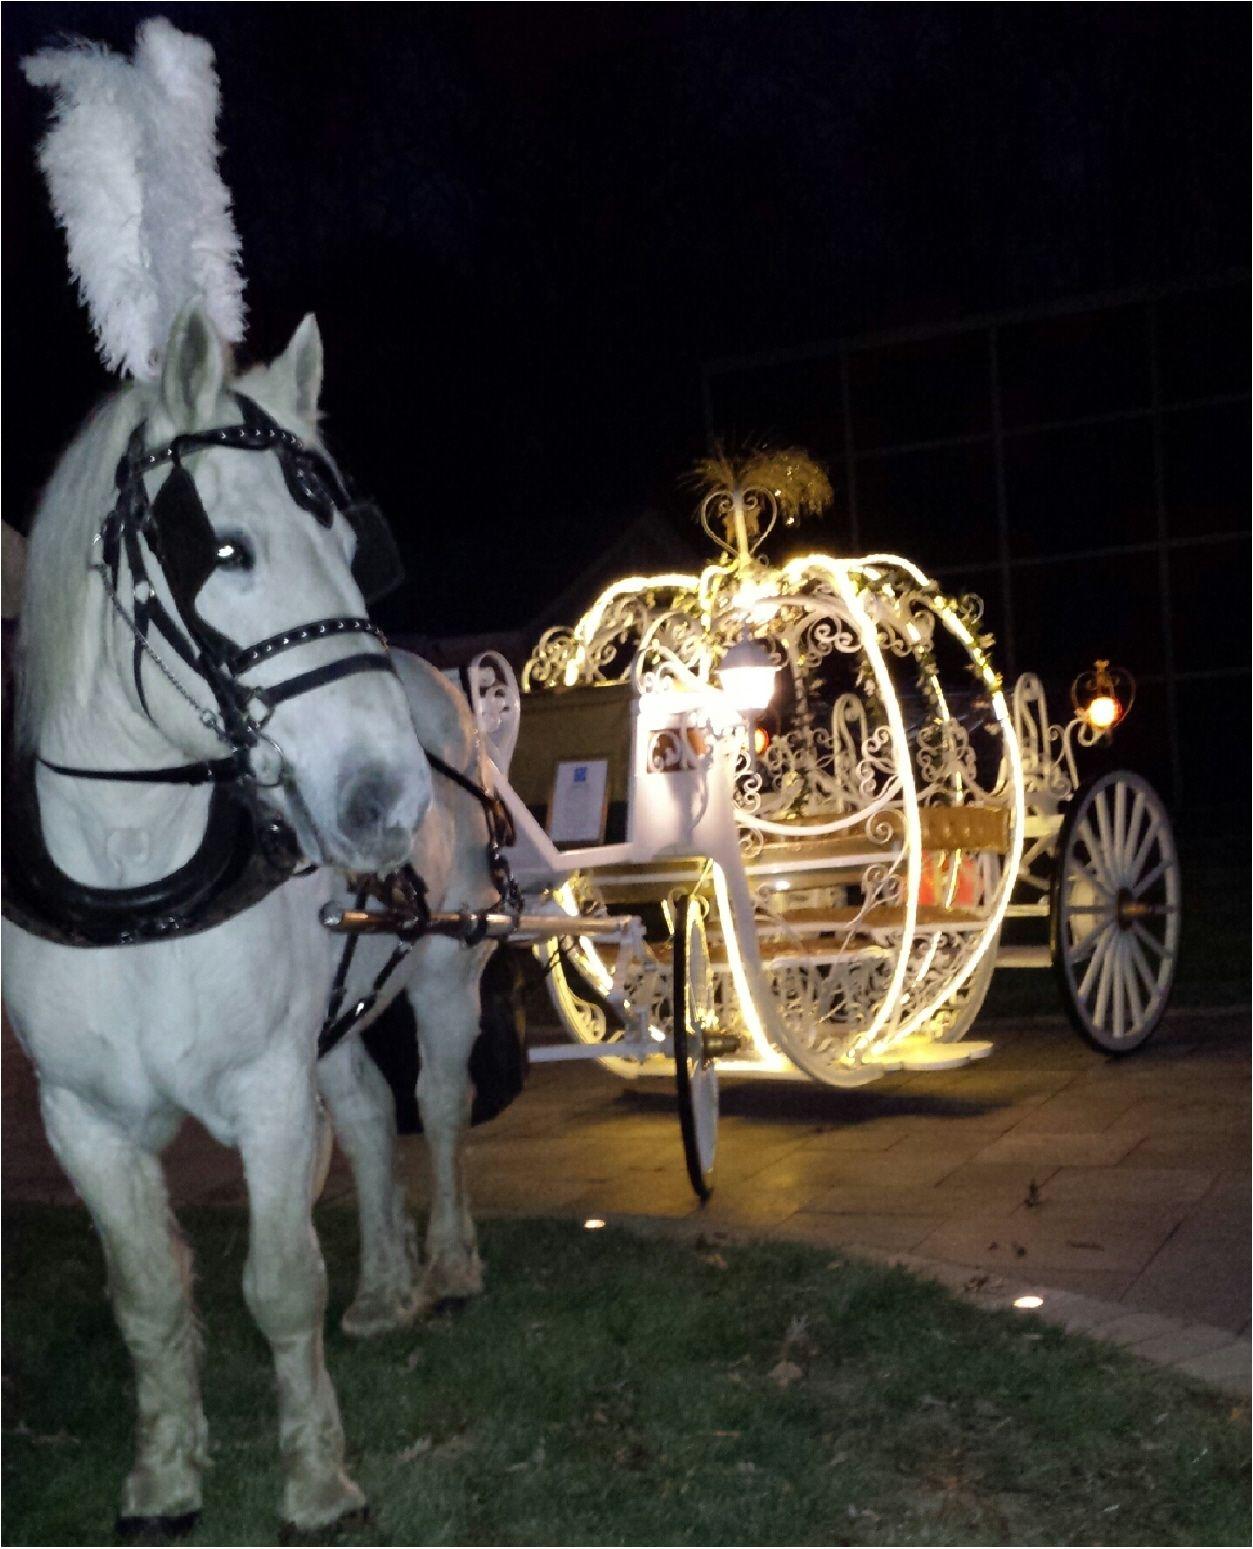 Cinderella Pumpkin Carriage All Lit Up Last Night At Crystal Manor Wedding Glboro Nj